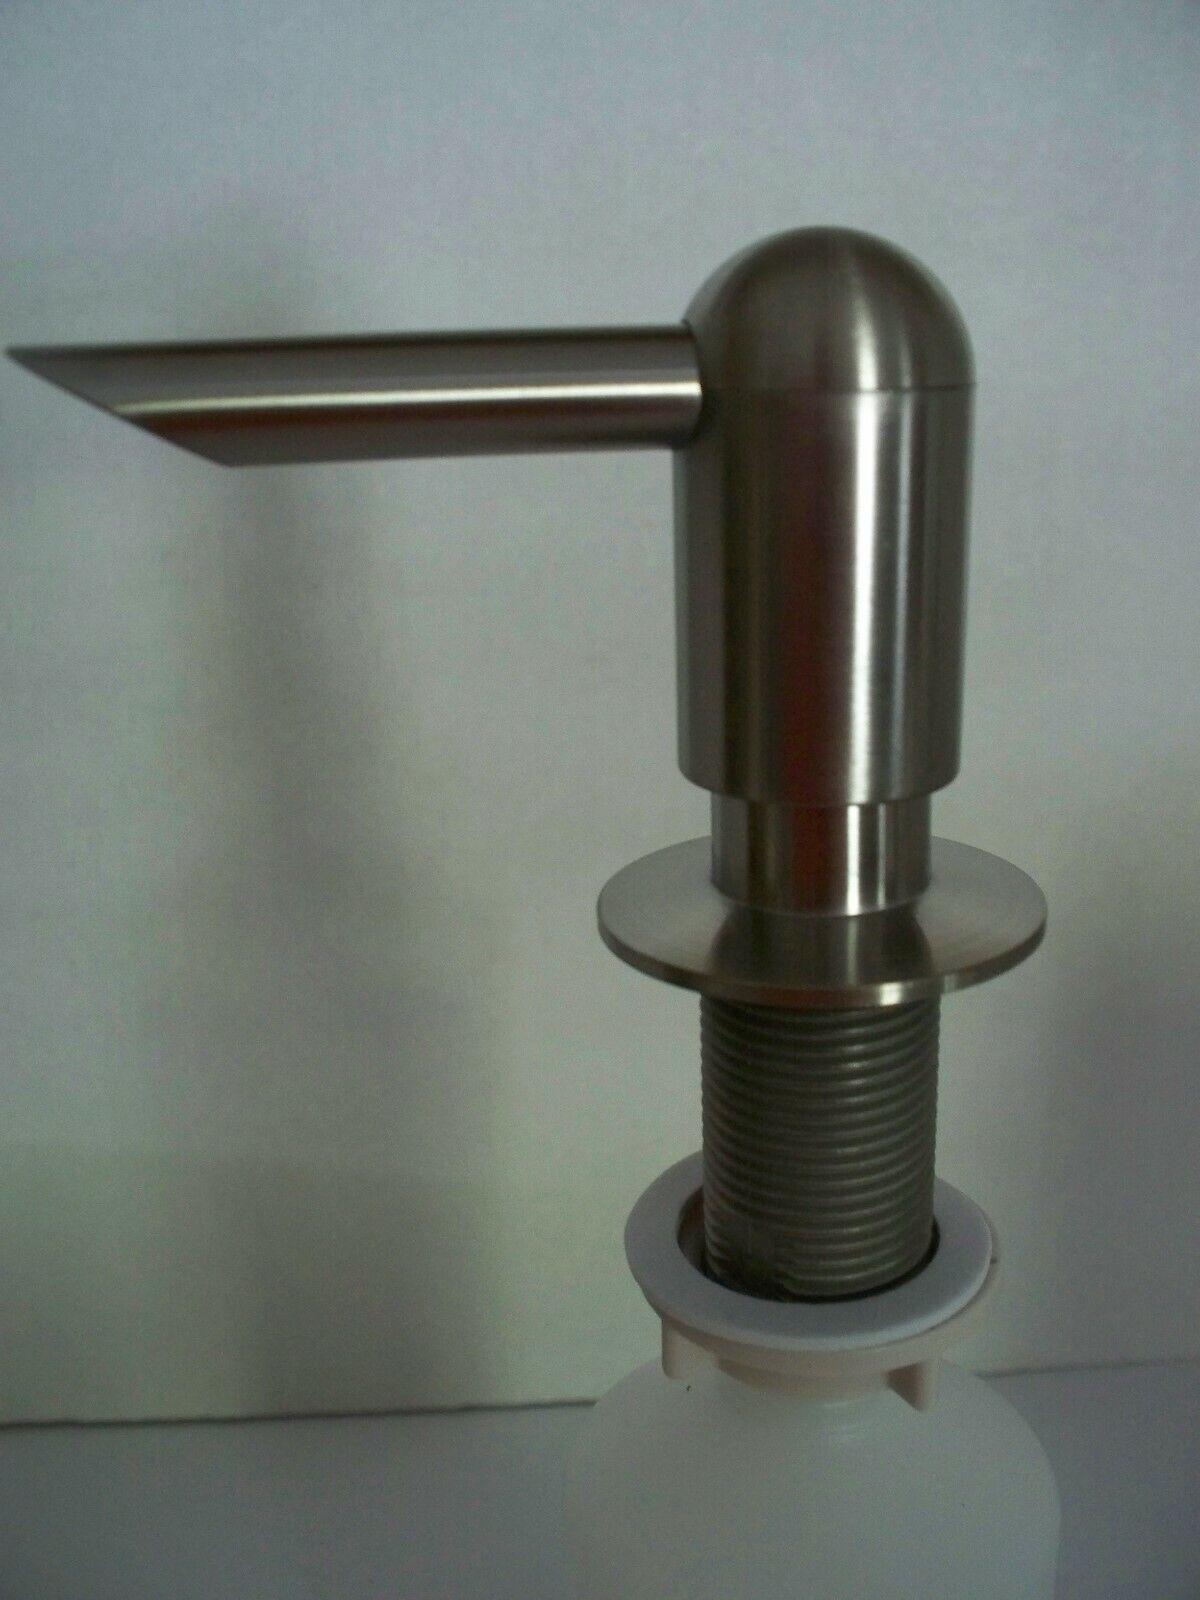 PEERLESS Brand Sink Mount Soap/Lotion Dispenser Stainless Steele Finish